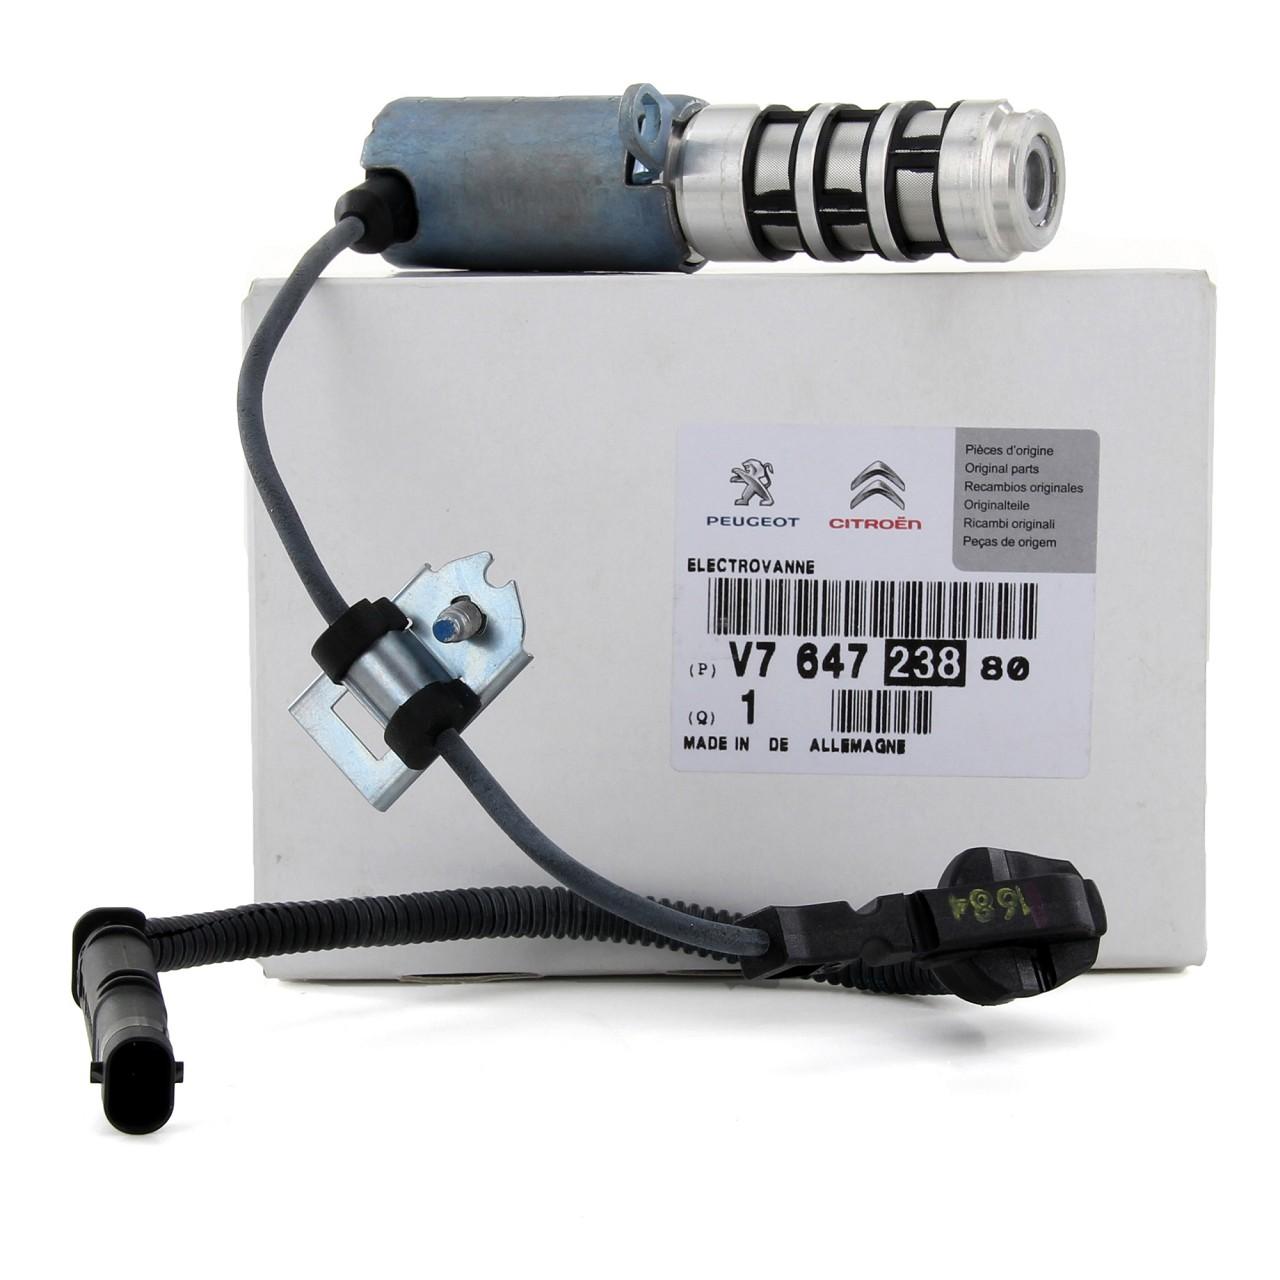 ORIGINAL Citroen Öldruckventil Berlingo C3 C4 5 DS3 DS4 DS5 V764723880